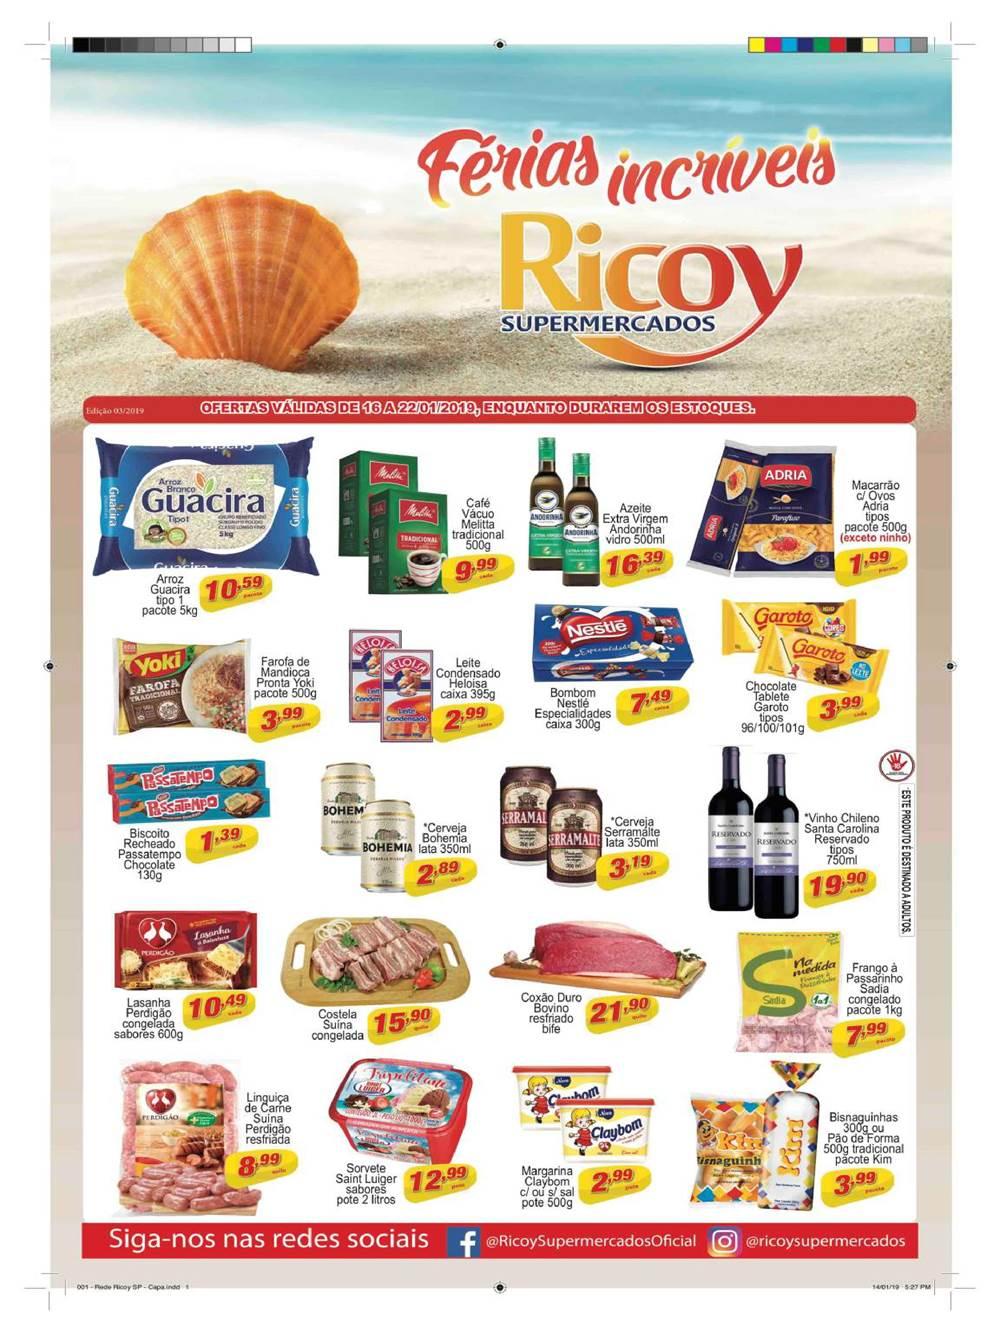 Ofertas-ricoy1-1 Ofertas de Supermercados - Economize!